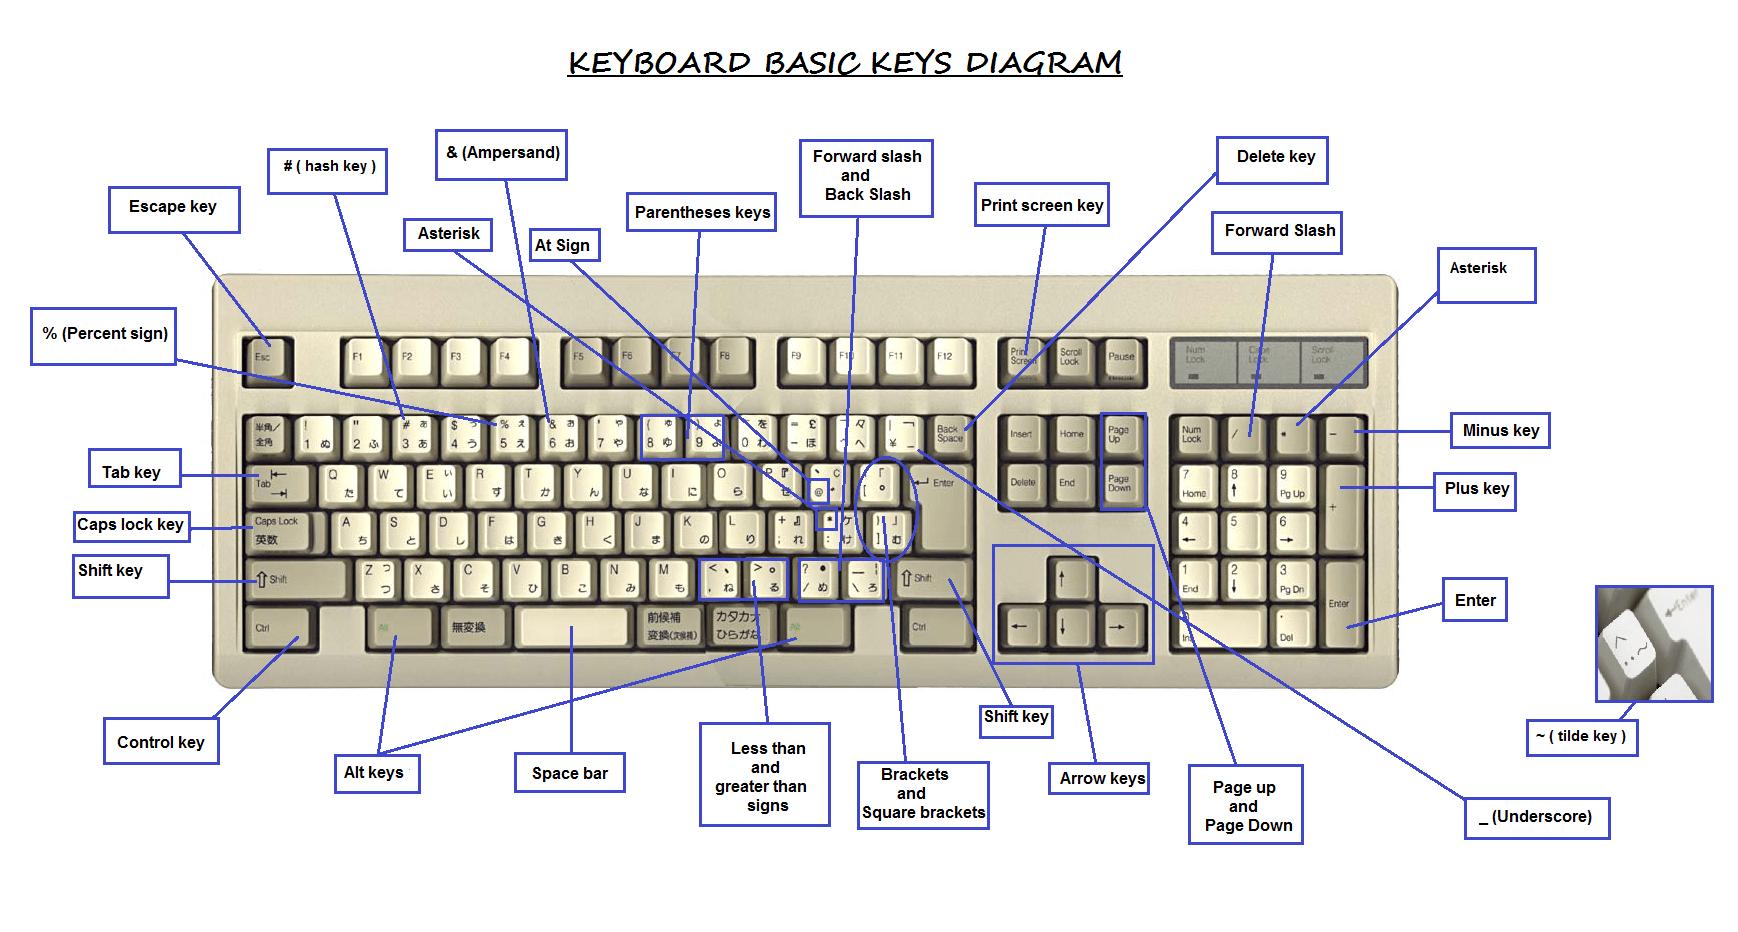 Keyboard Diagram And Key Definitions